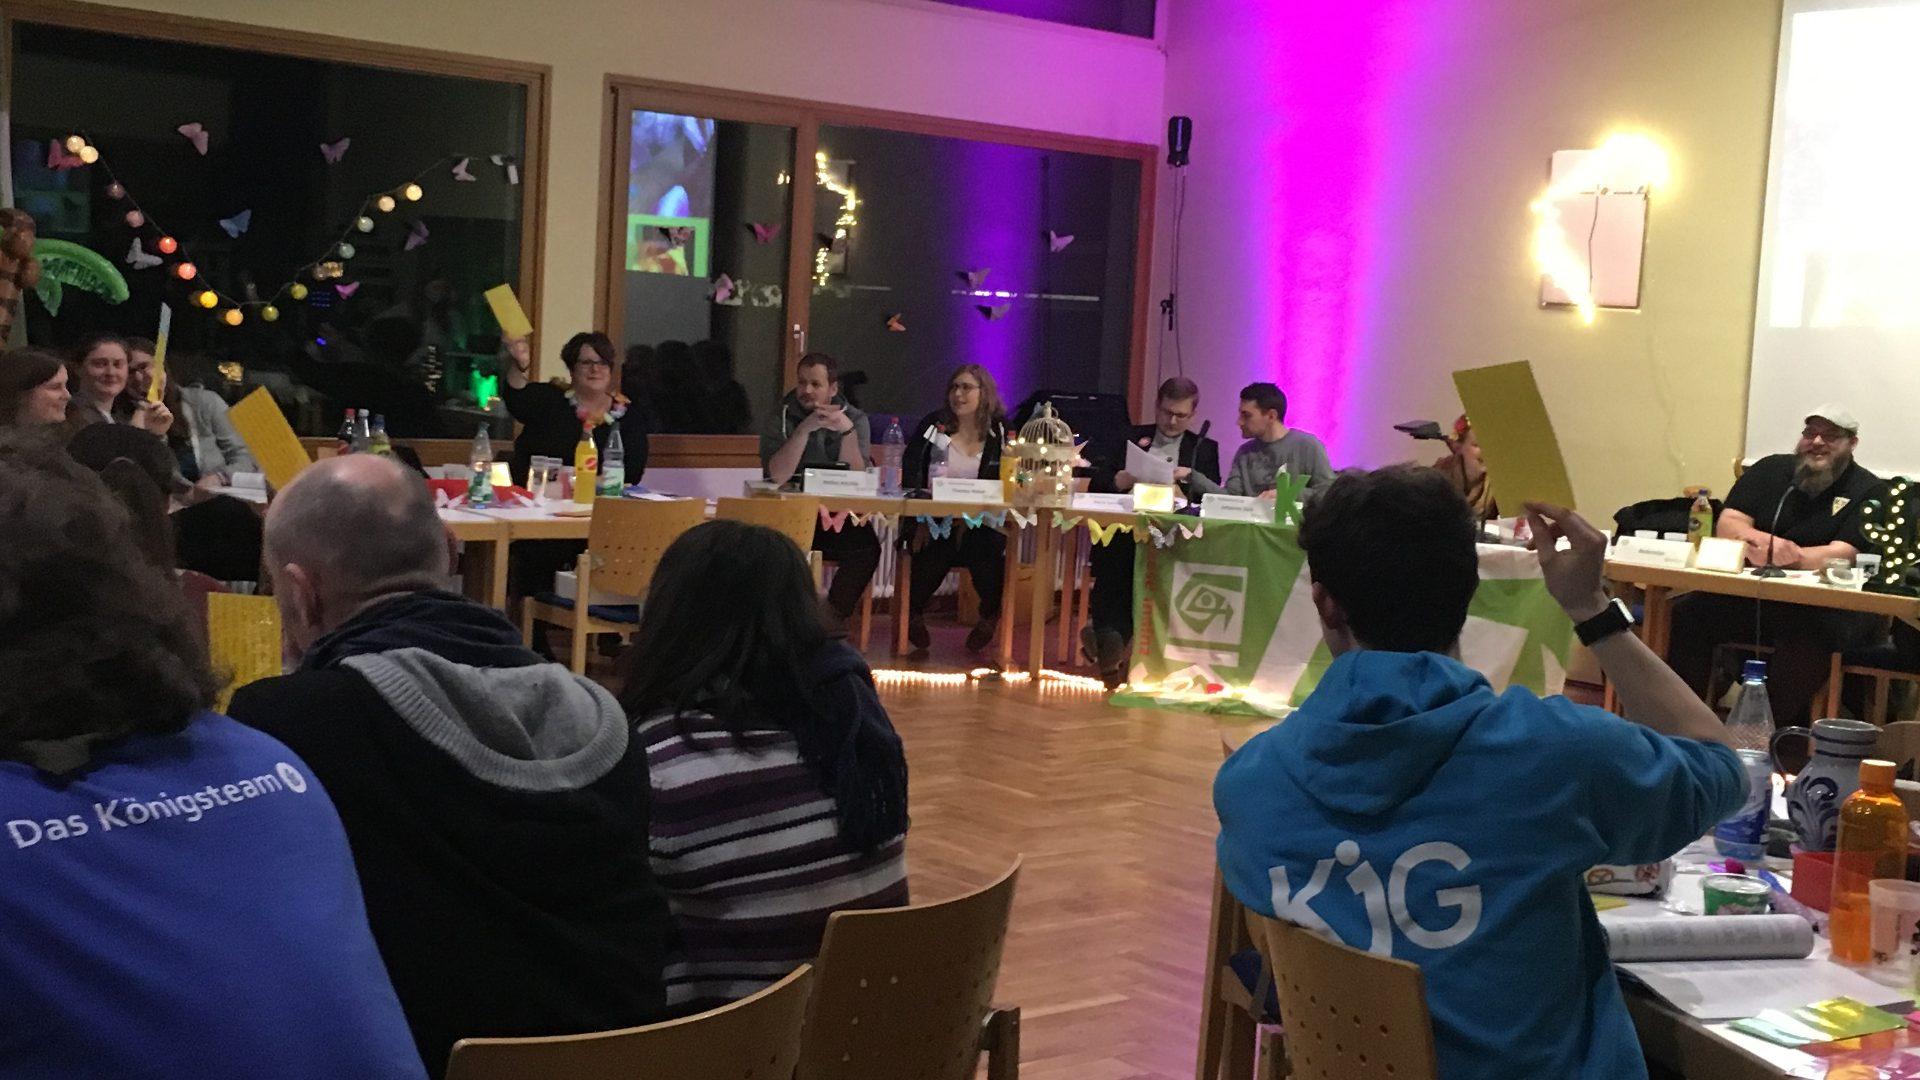 KjG Diözesanverband Mainz